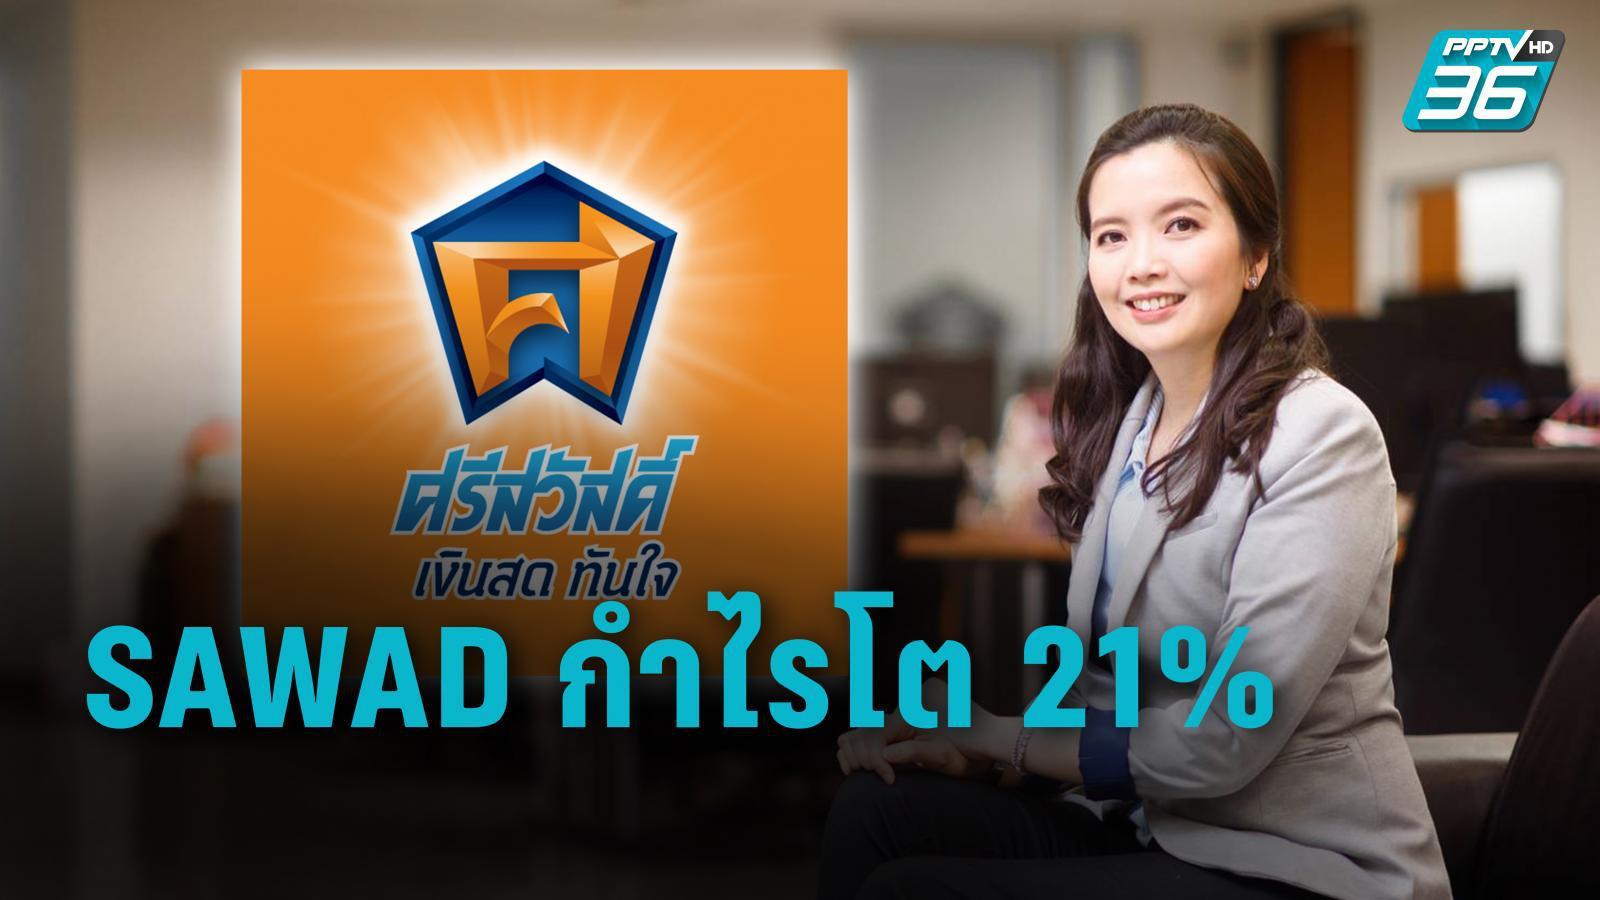 SAWAD โชว์ไตรมาส2/63 กำไรโต 21% ยันมีสภาพคล่องเพียงพอ